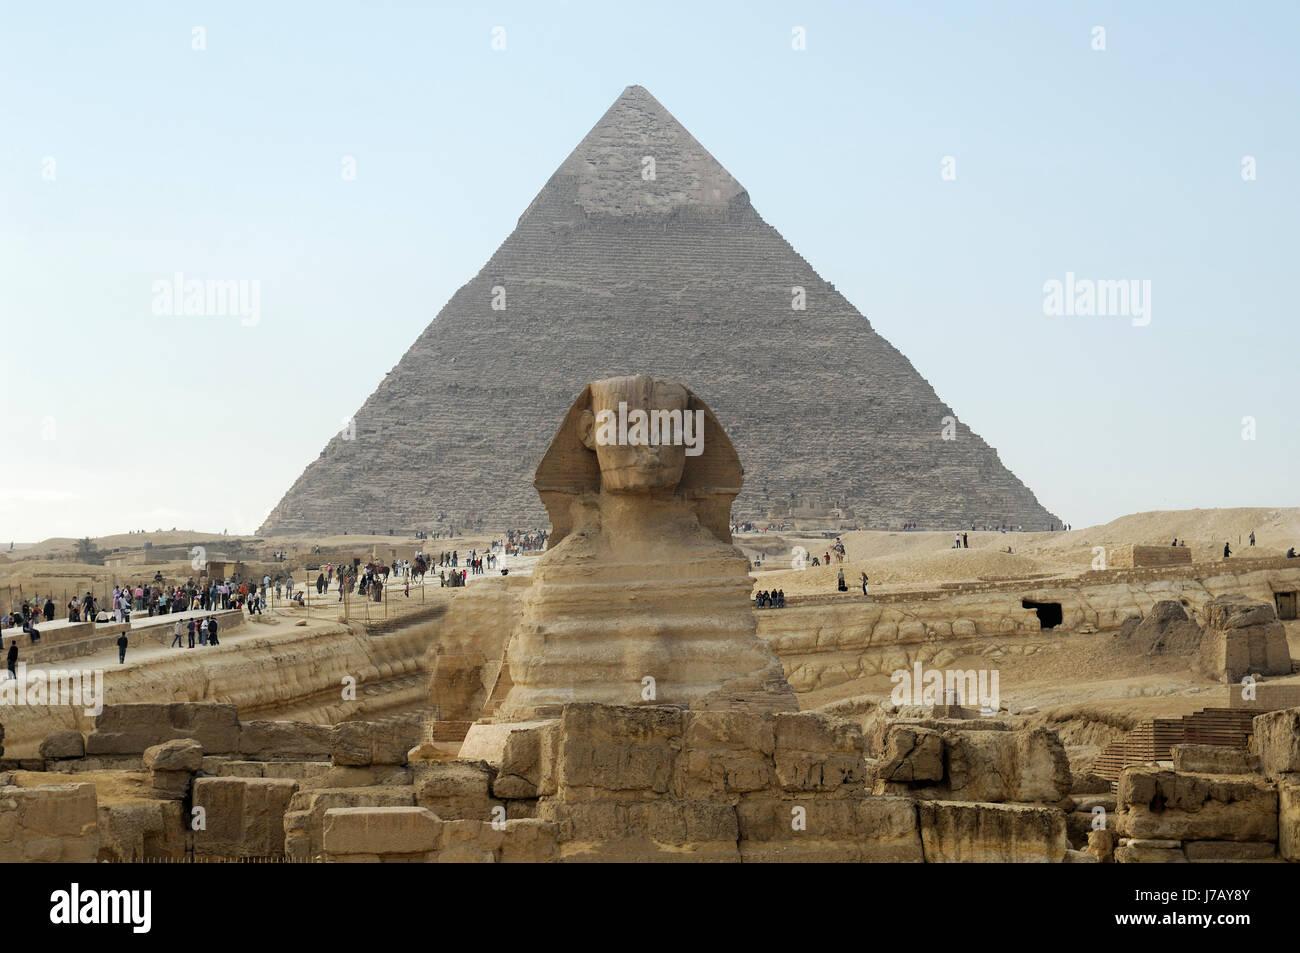 sphinx gizeh pyramide gypten landmark afrika afrikaner sphinx gizeh pyramide - Stock Image